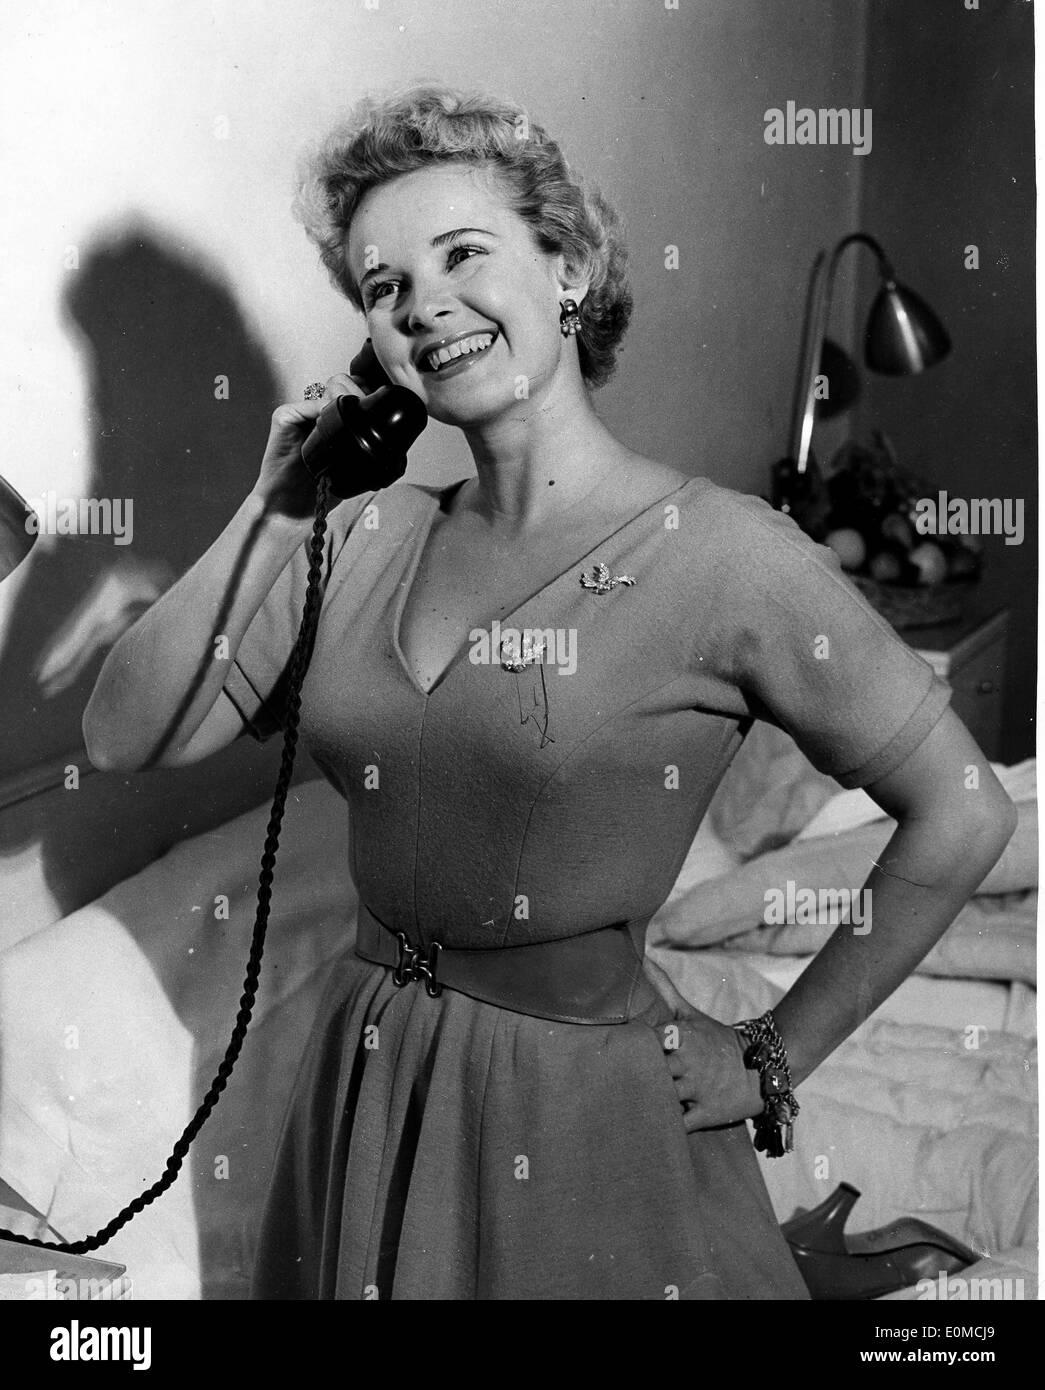 Actress Mona Freeman on the phone at the Savoy Hotel - Stock Image